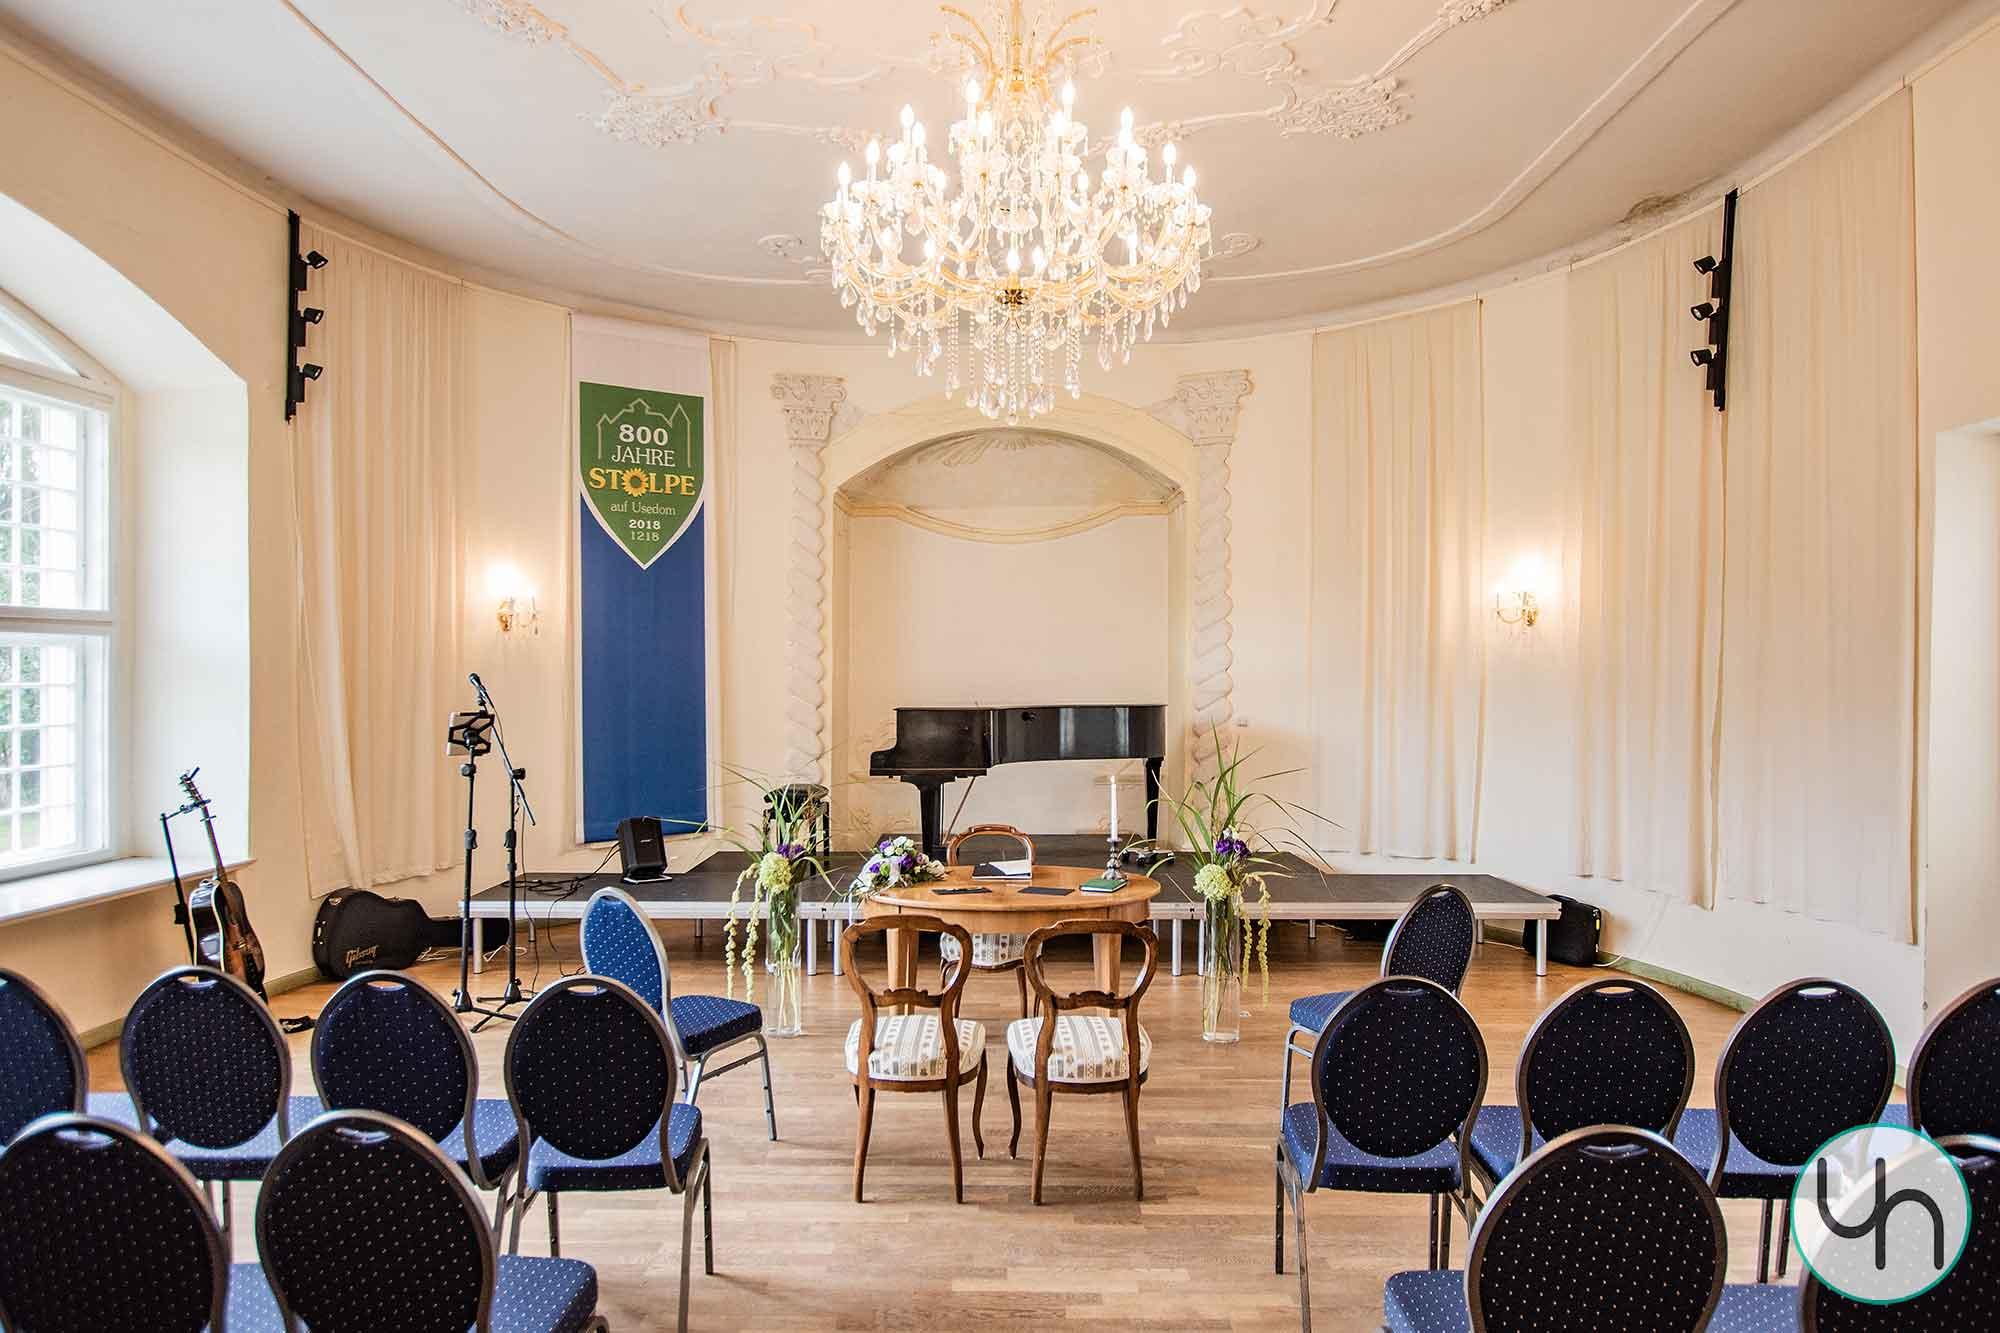 Schloss Stolpe Innenaufnahme